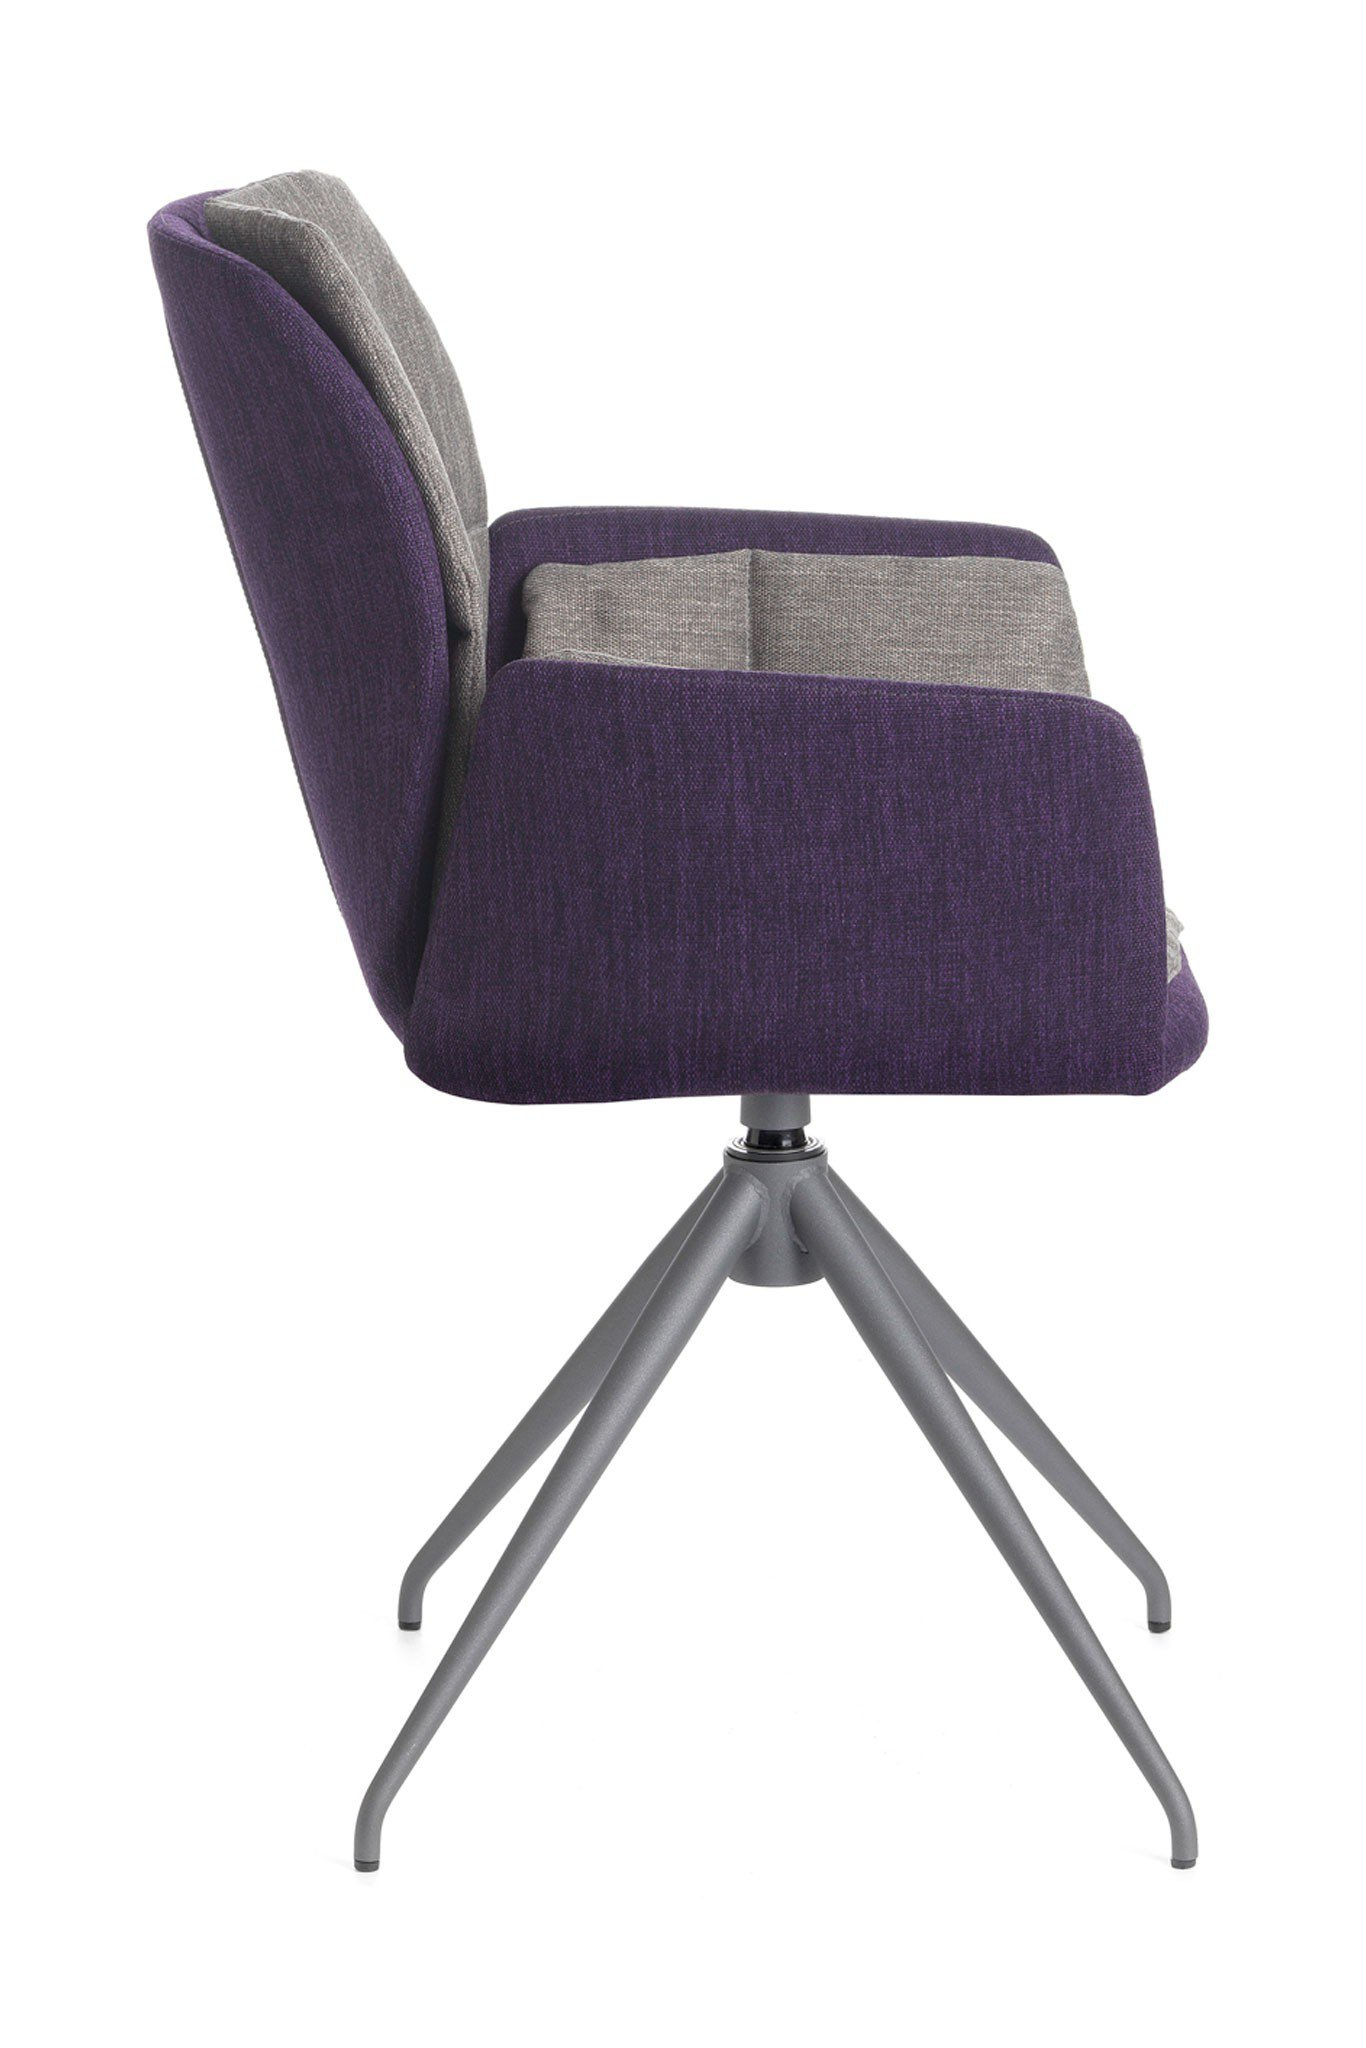 mobitec stuhl mood 96 uni metall grey lila drehbar m bel letz ihr online shop. Black Bedroom Furniture Sets. Home Design Ideas